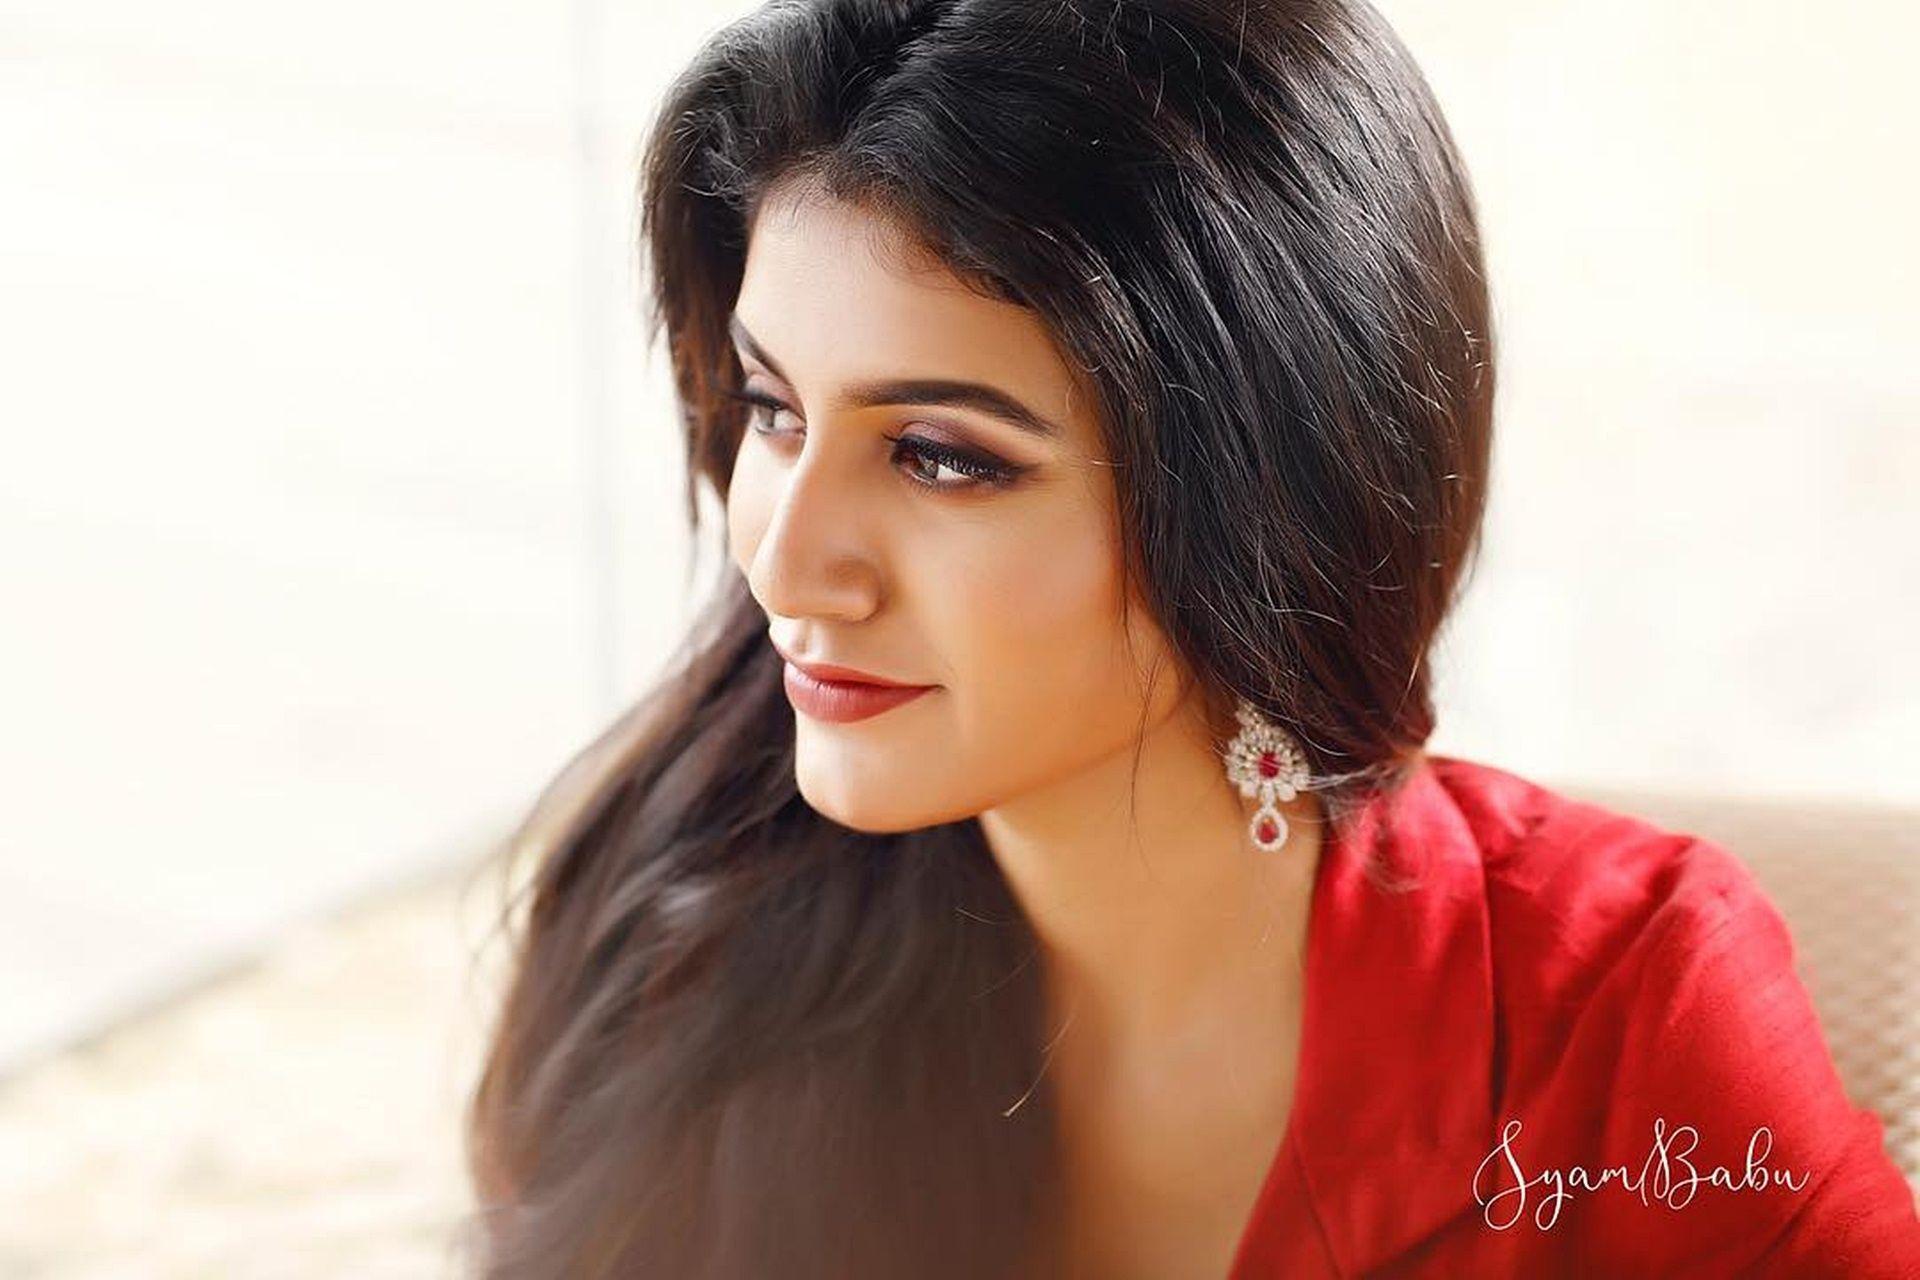 Bollywood Actress Hd Wallpapers Top Free Bollywood Actress Hd Backgrounds Wallpaperaccess